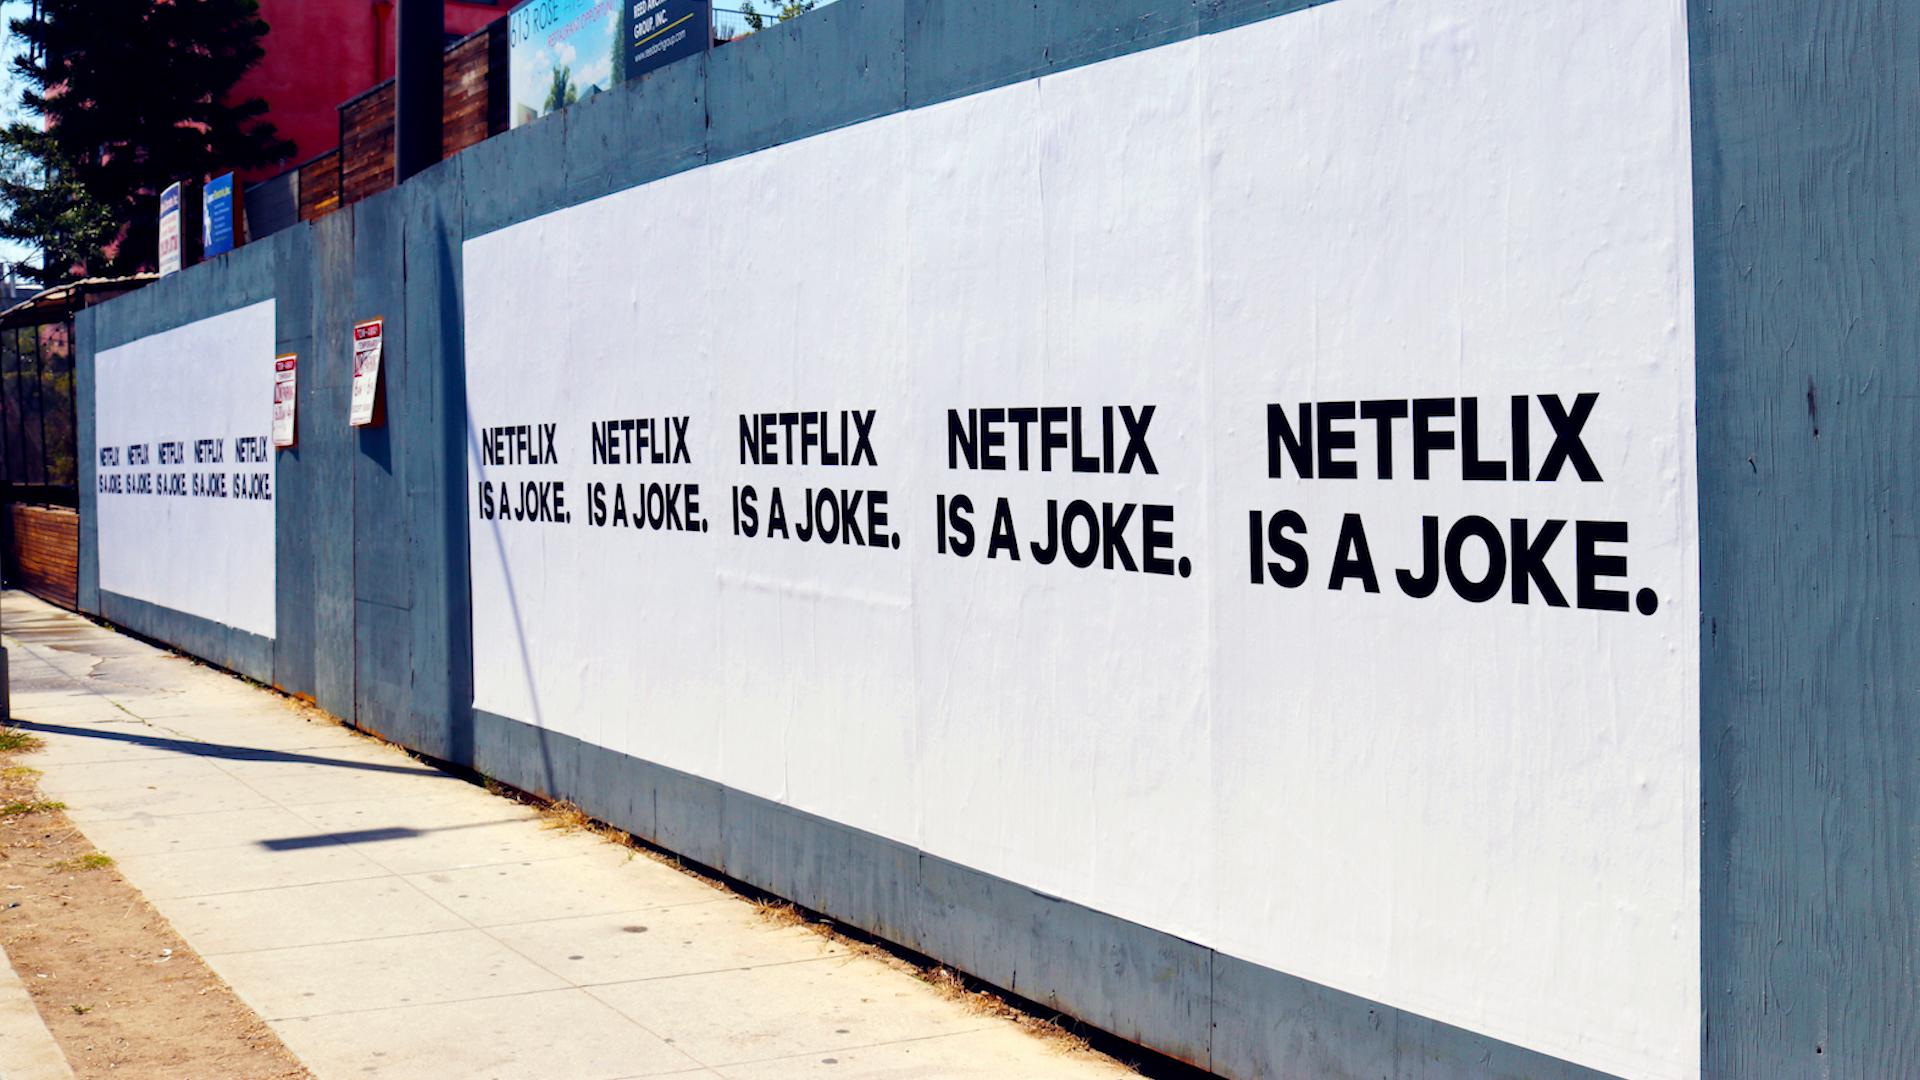 Thumbnail for Netflix Is A Joke